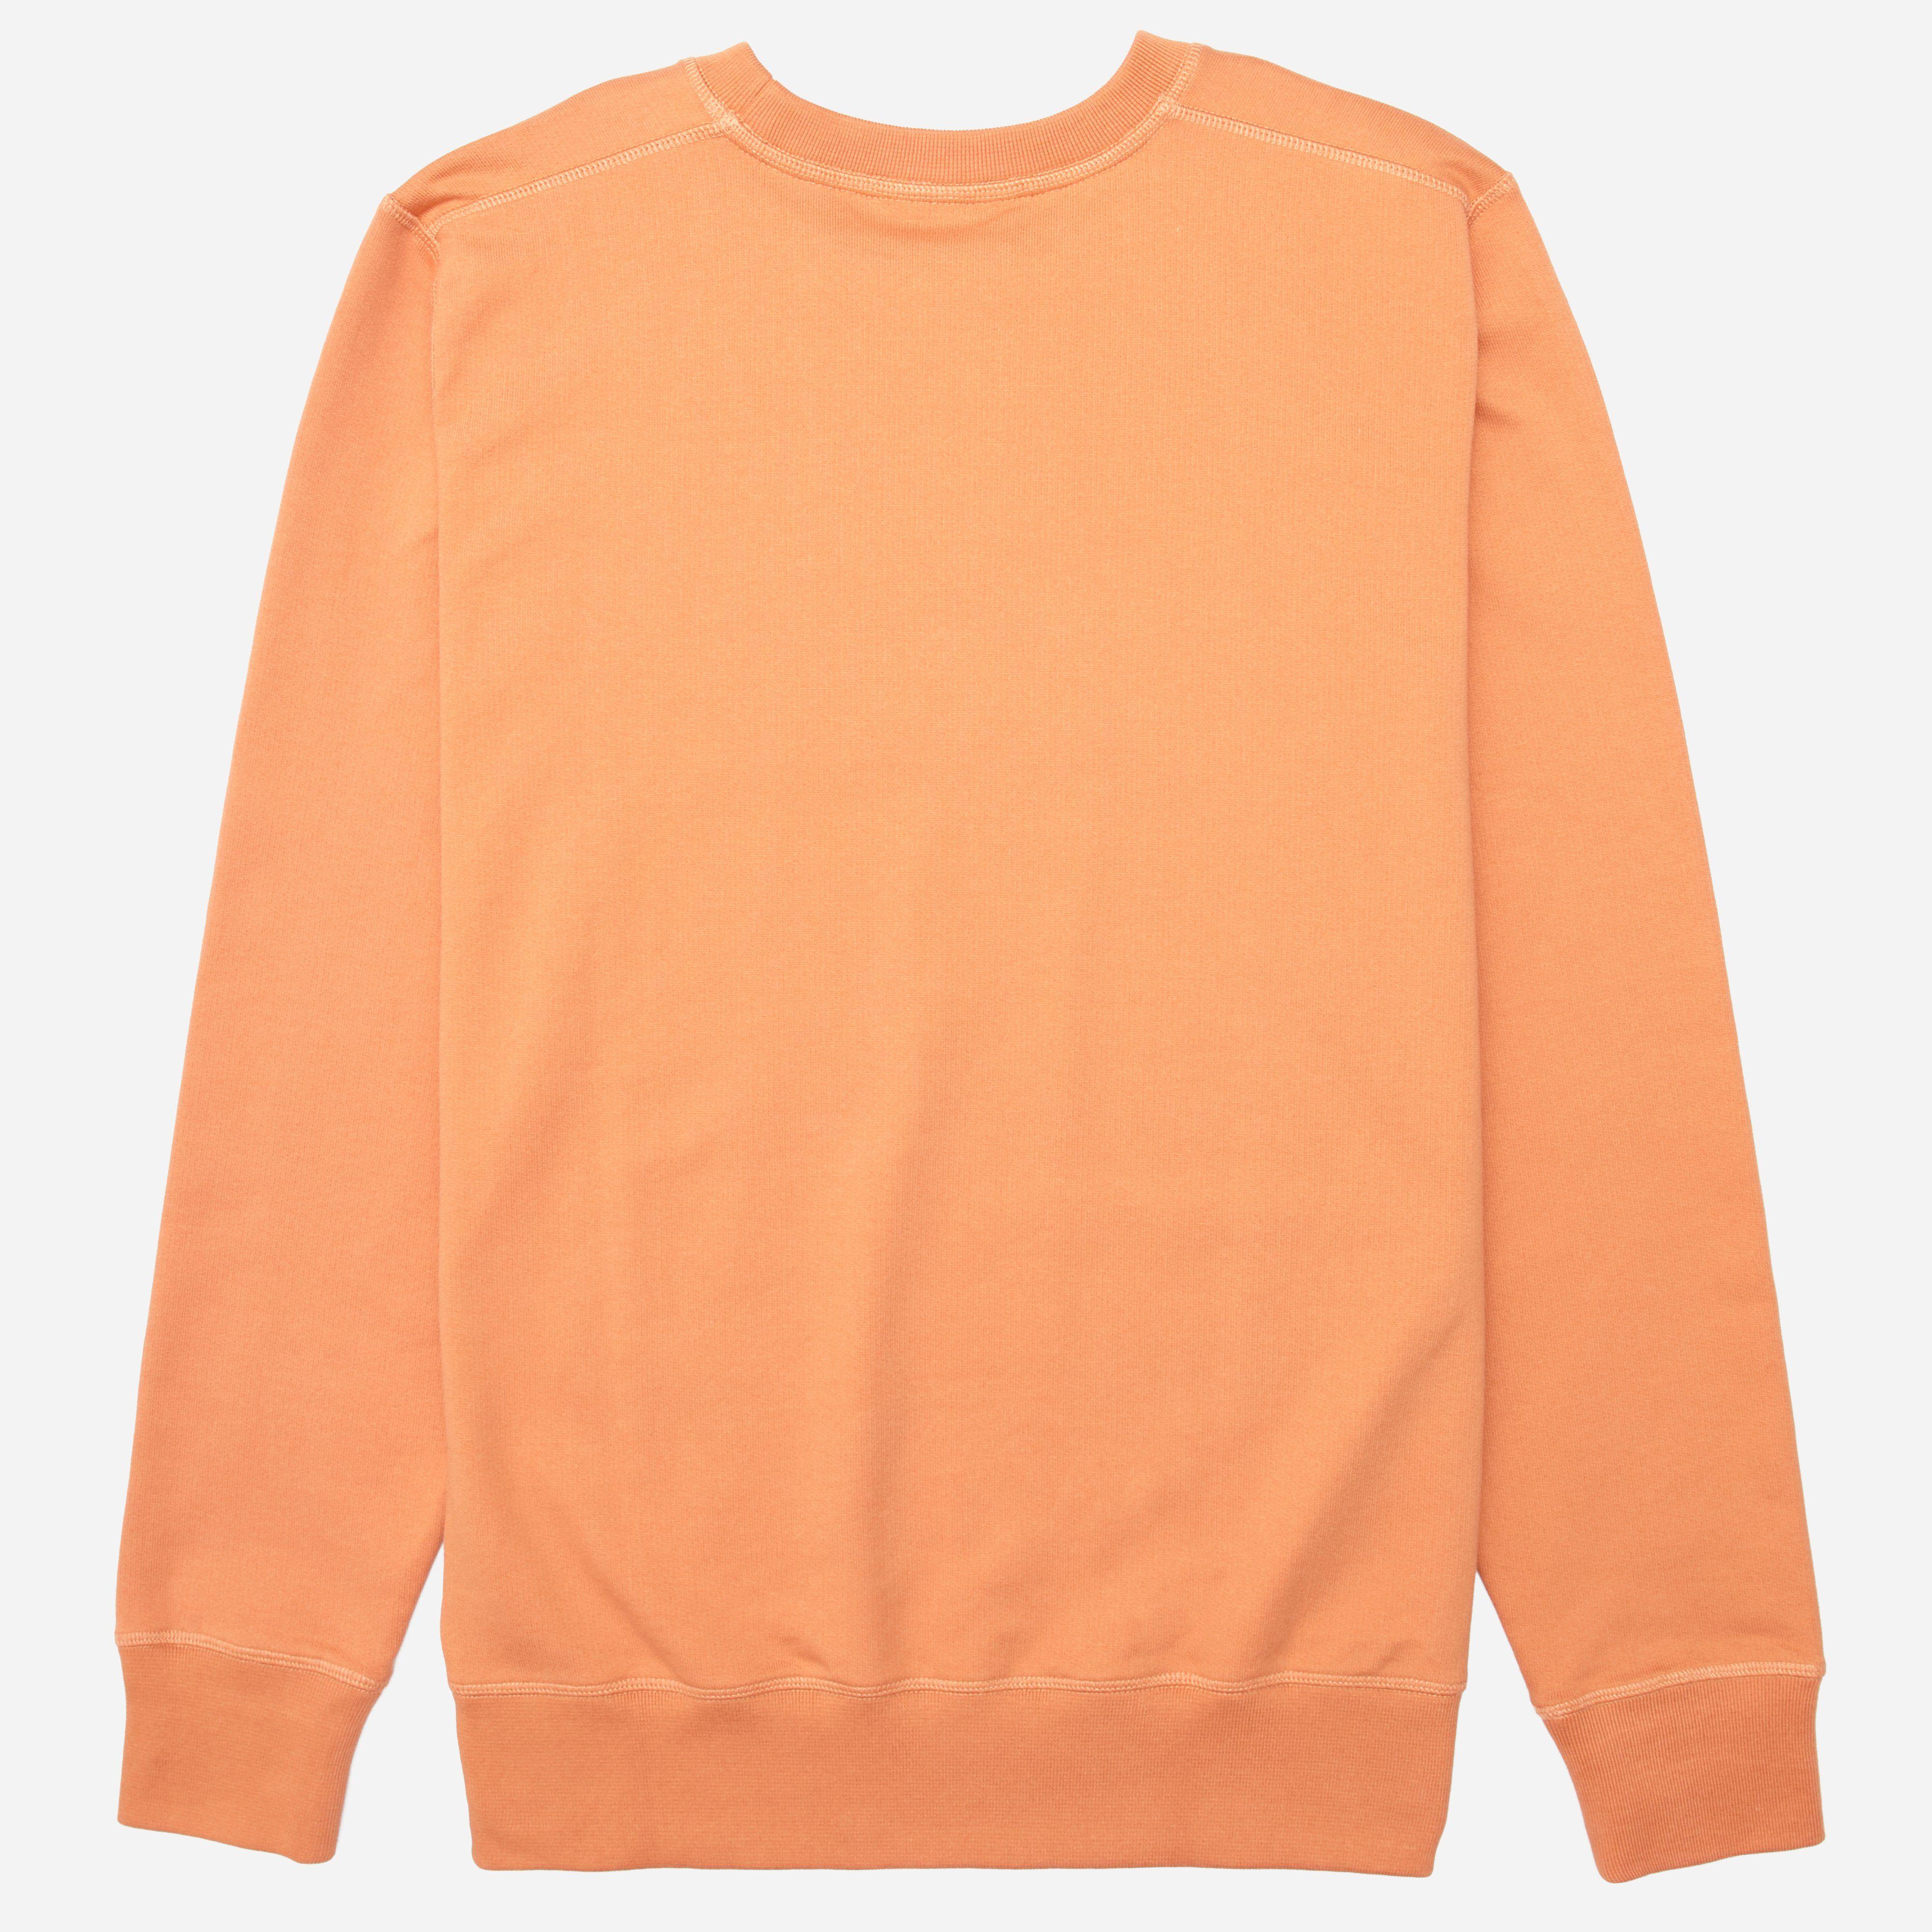 Bleu De Paname Shark Sweatshirt